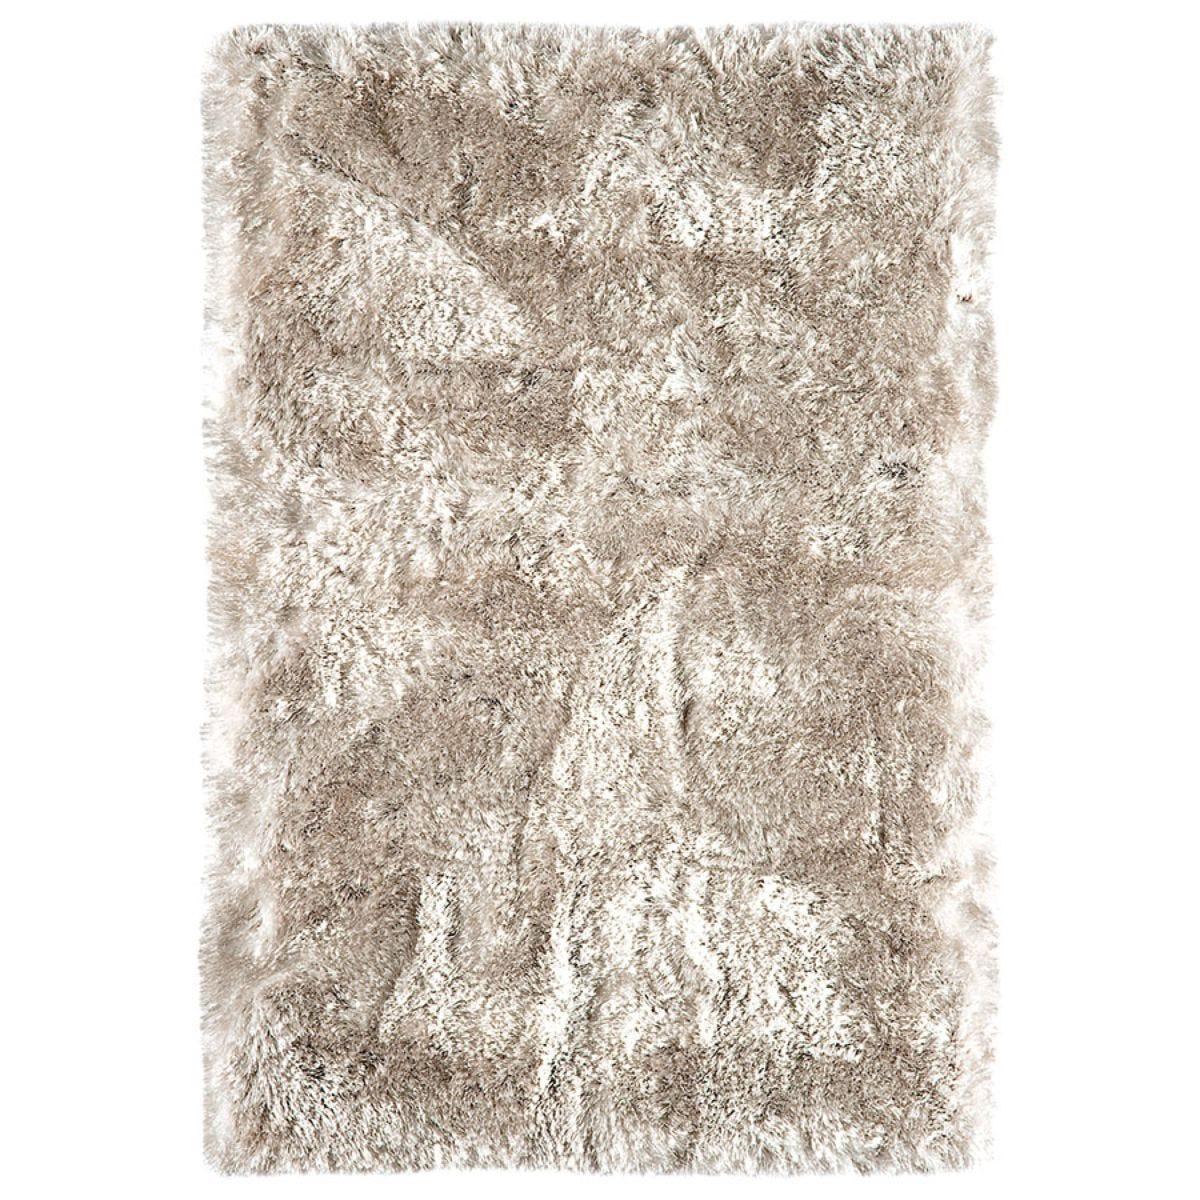 Asiatic Plush Shaggy Rug, 140 x 200cm - Sand